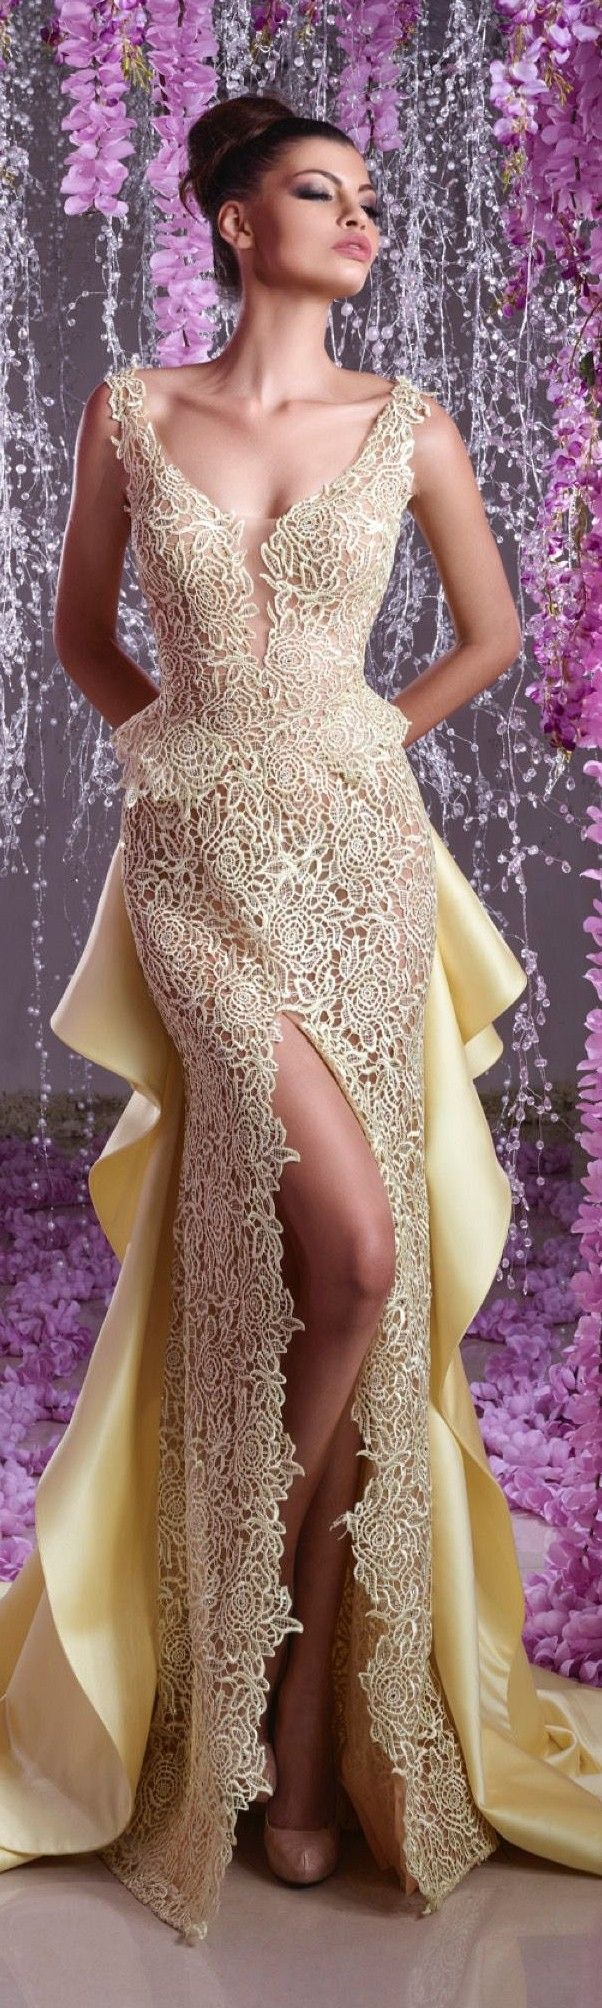 Hanna Toumajean couture 2016 spring summer